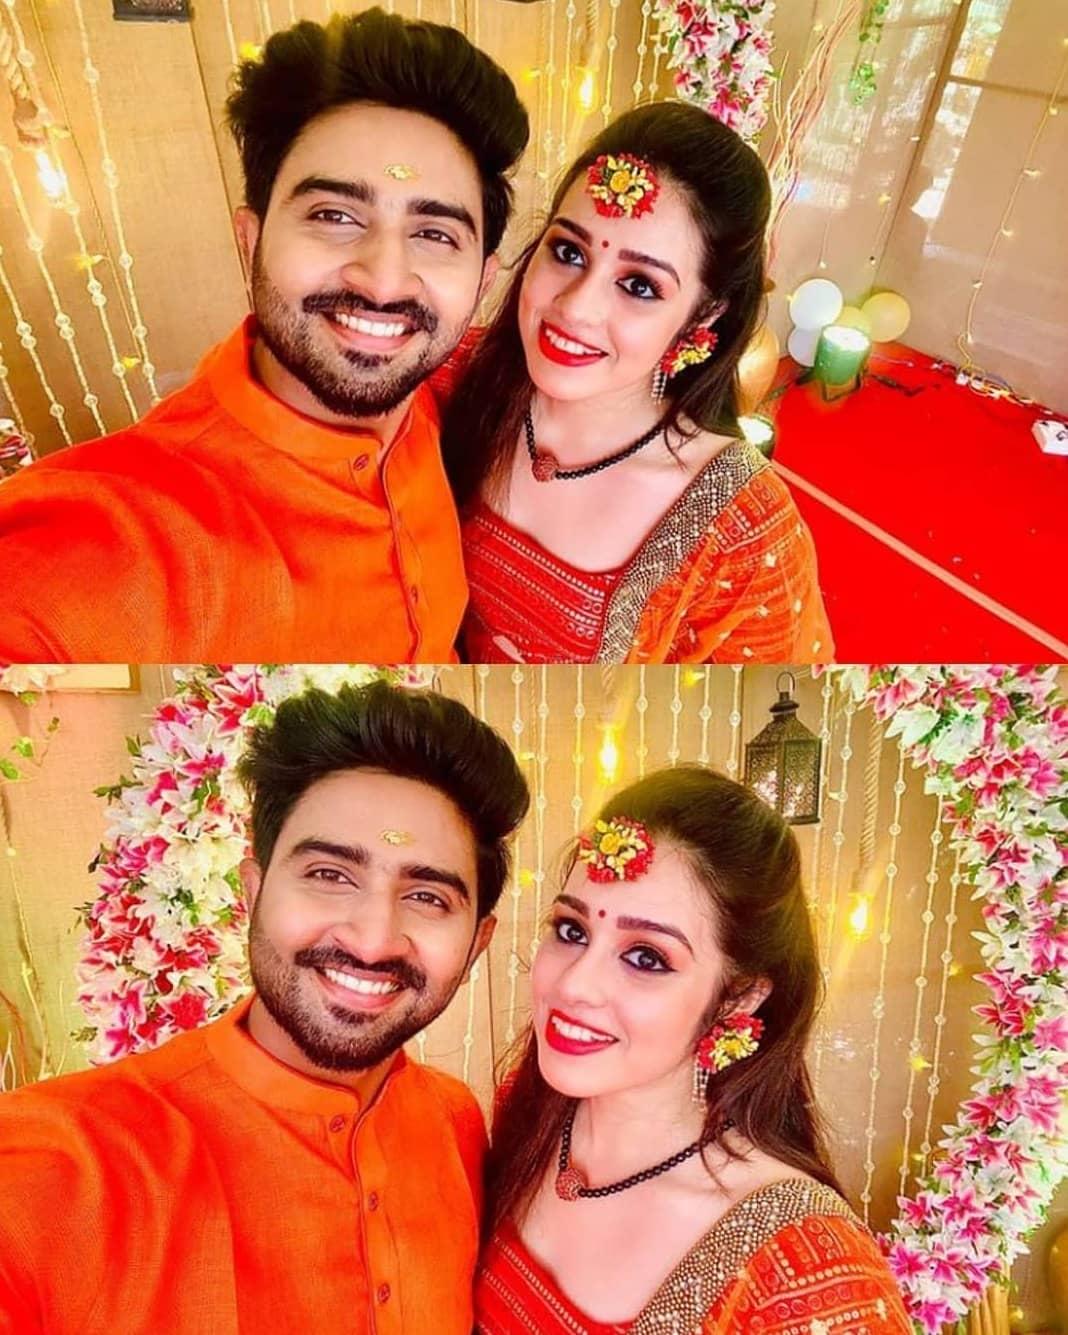 See Pics Popular Serial Actor Gets Married News Indiaglitz Com 1.1 govind padmasoorya family, wife, parents. see pics popular serial actor gets